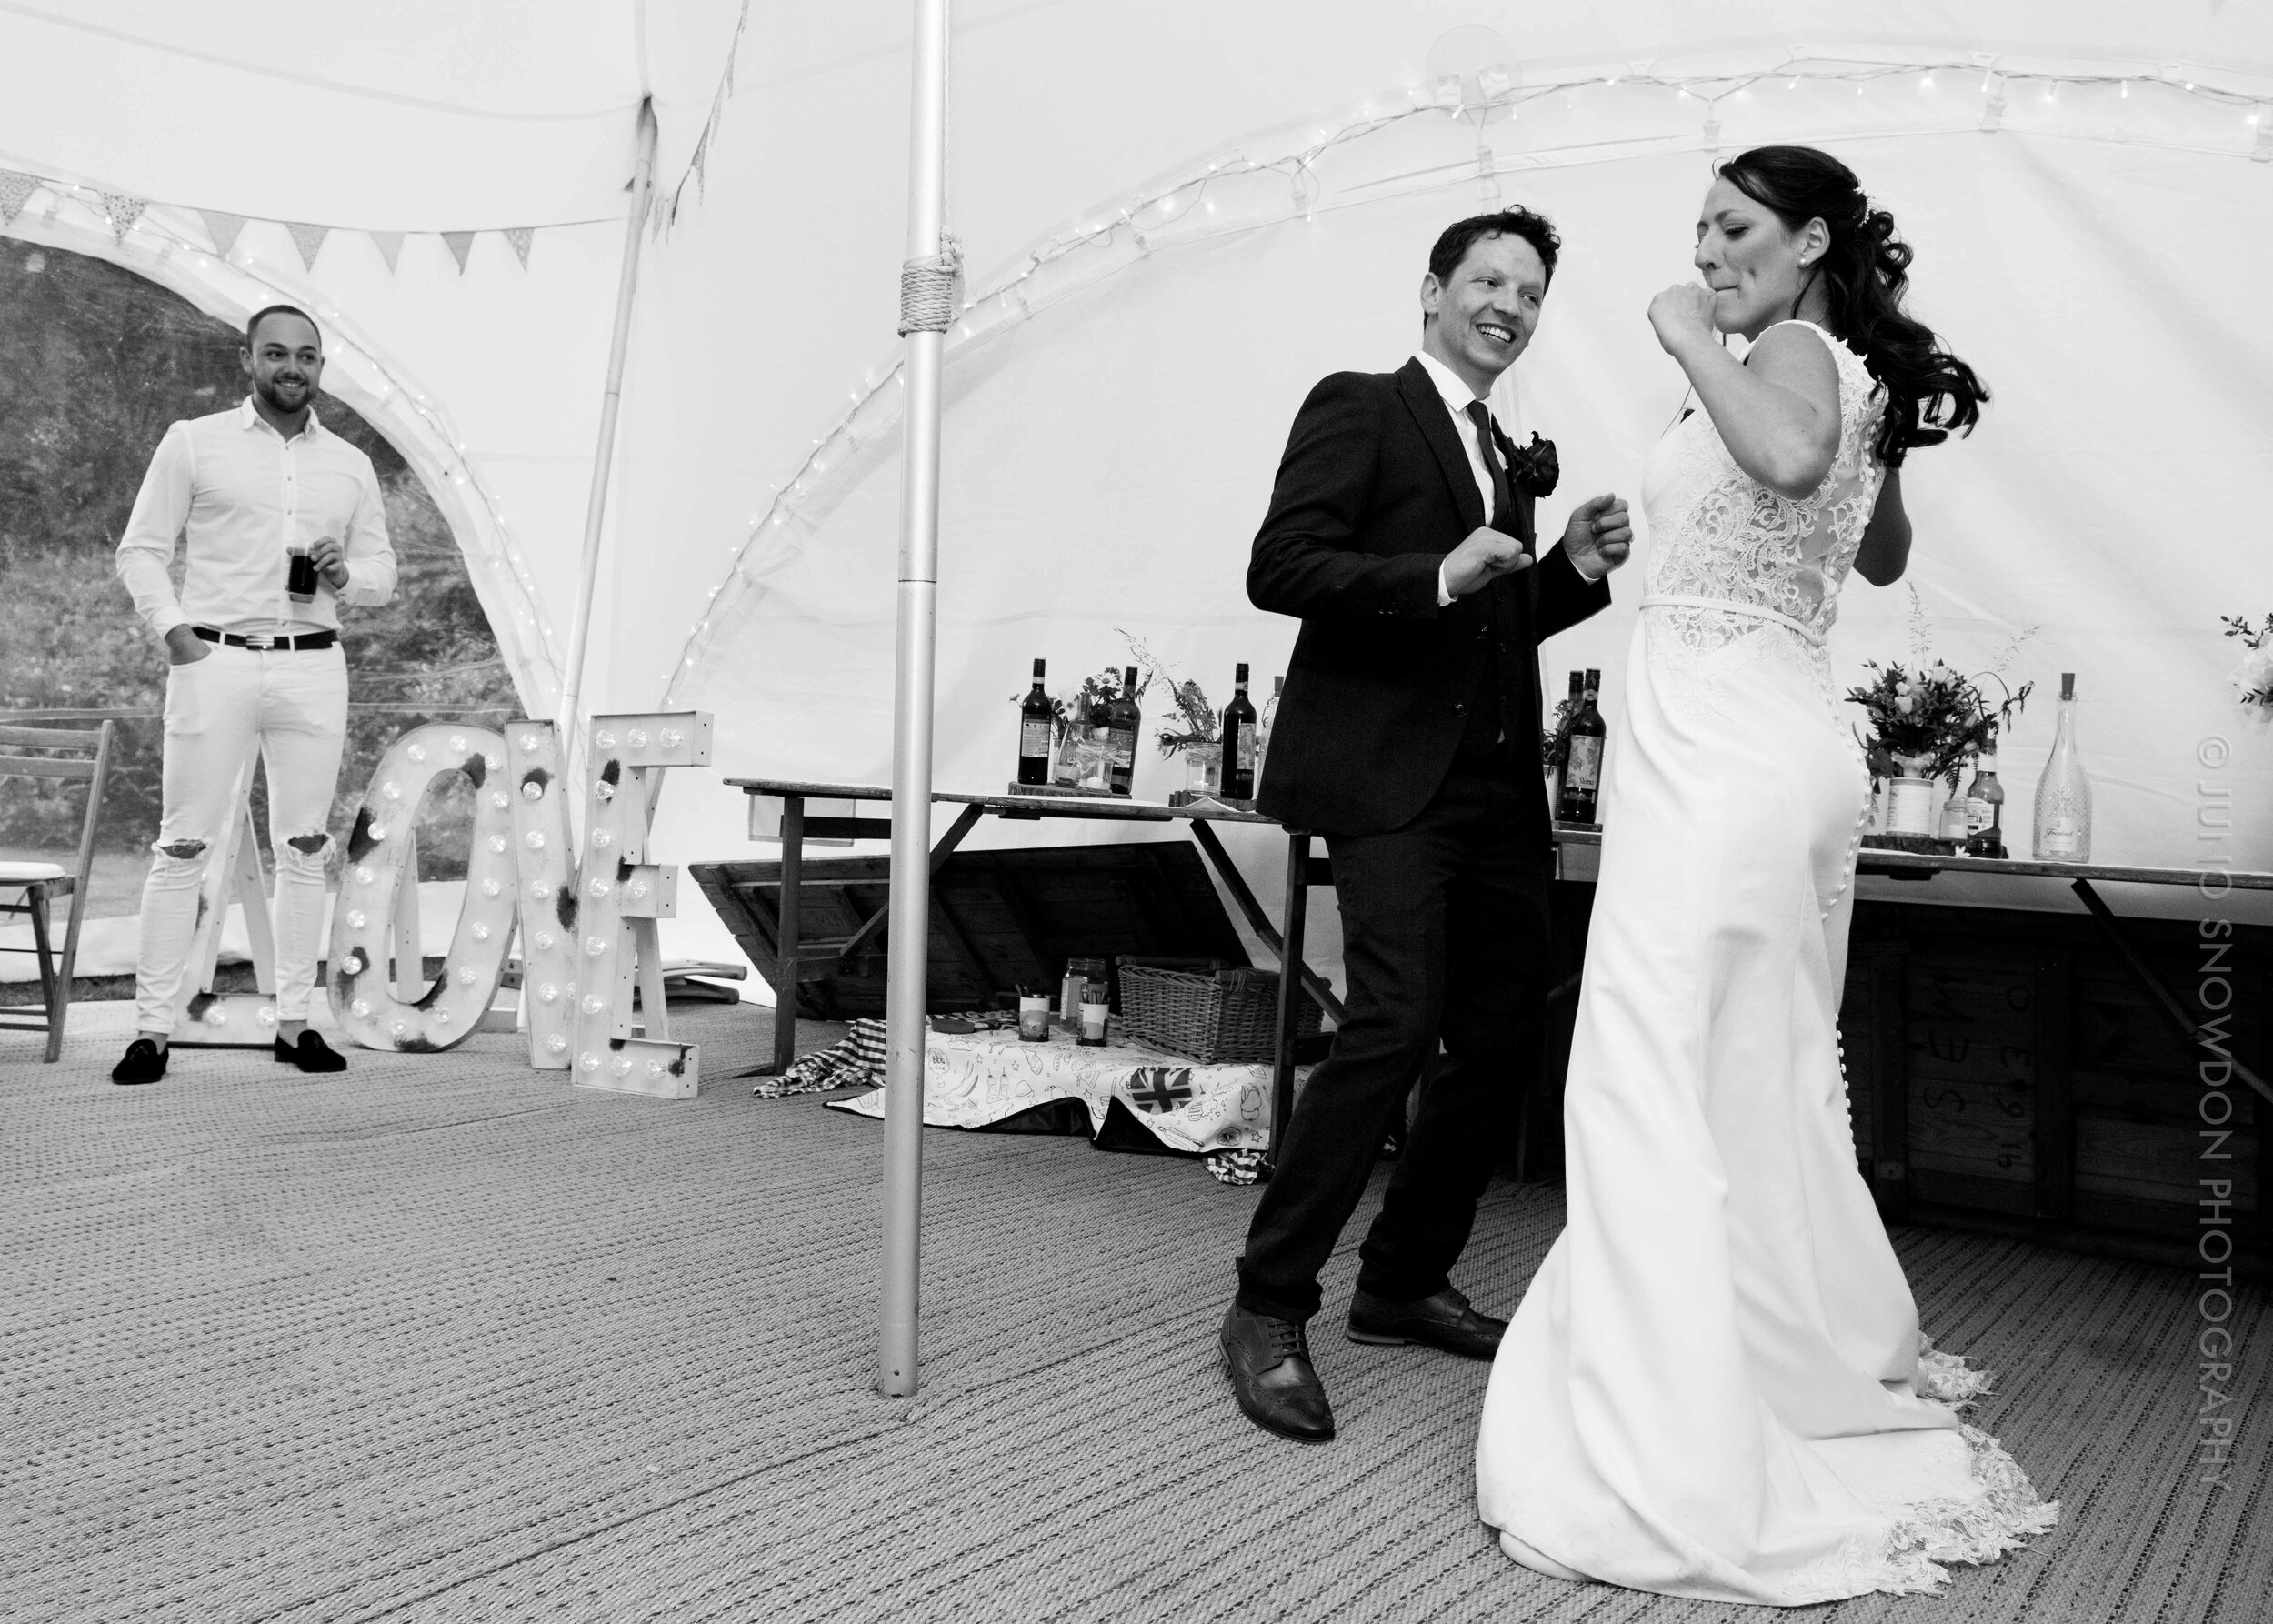 juno-snowdon-photography-wedding-8408.jpg